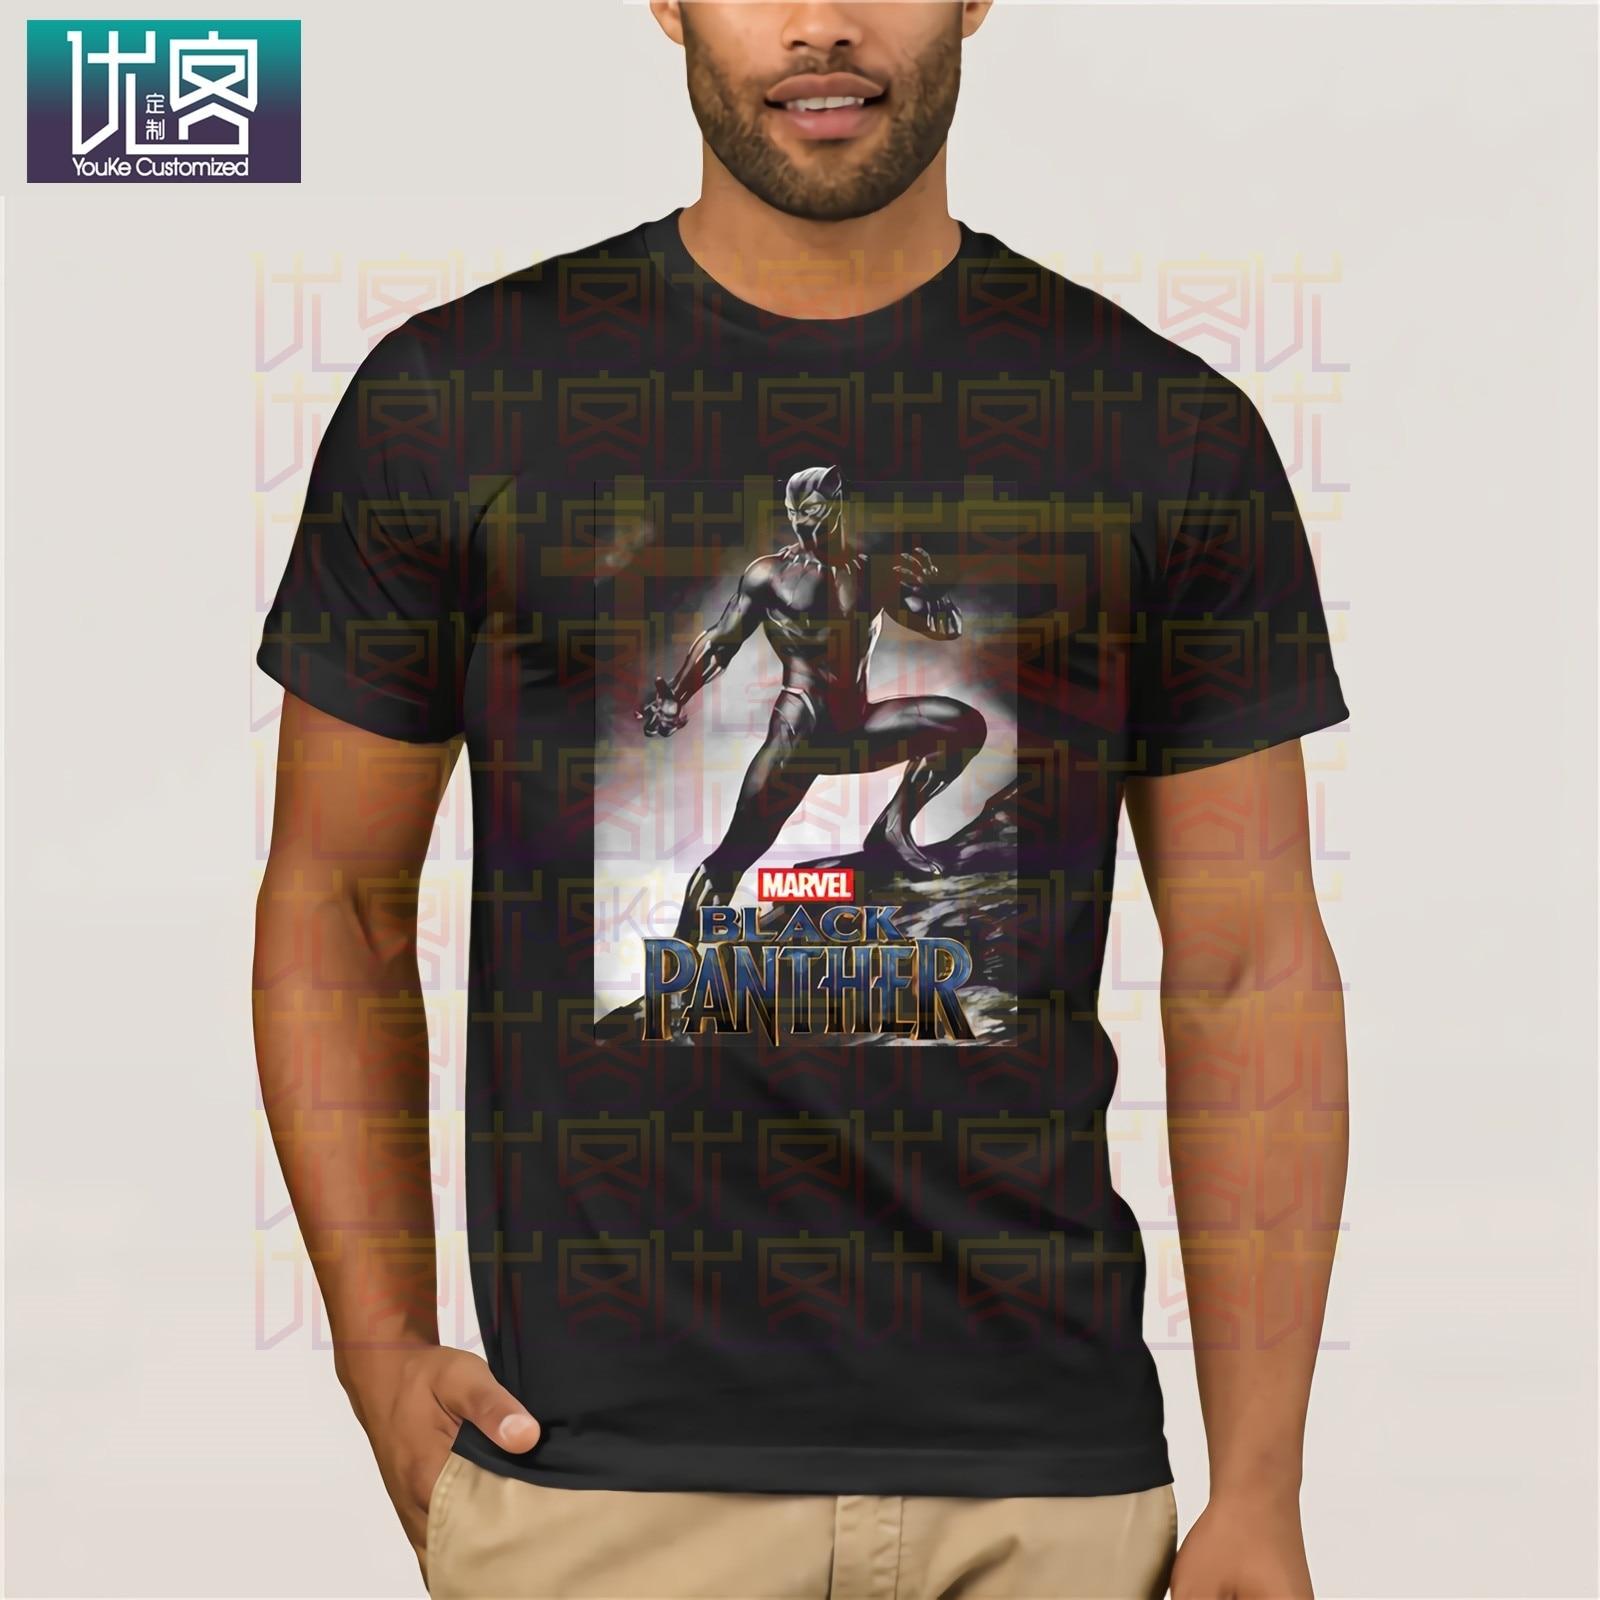 Marca Gildan Black Panther Marvel Poster estilo camisetas 2019 verano hombres de manga corta Camiseta Vintage Crew Neck